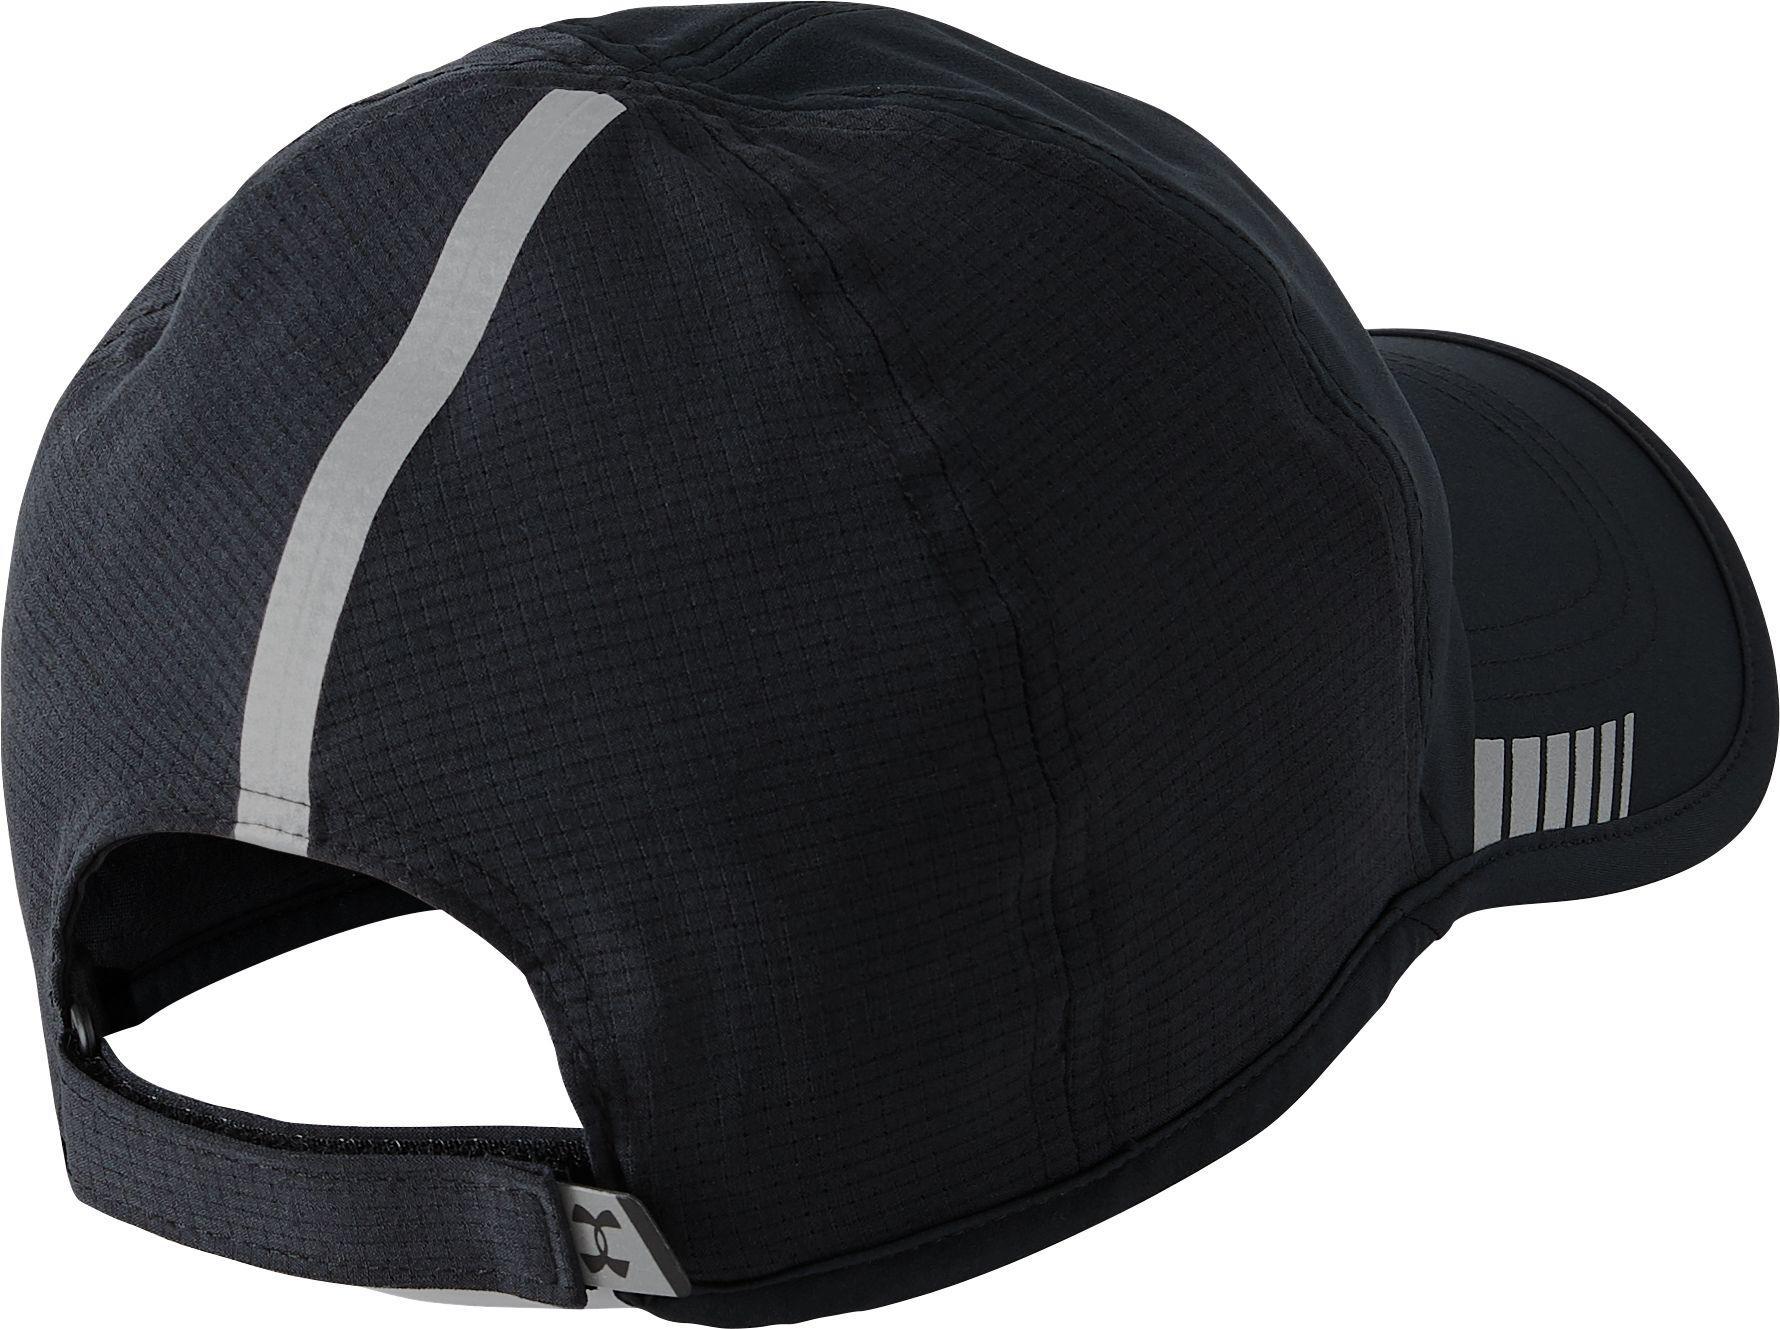 0553399852b Under Armour - Black Launch Armourvent Running Hat for Men - Lyst. View  fullscreen